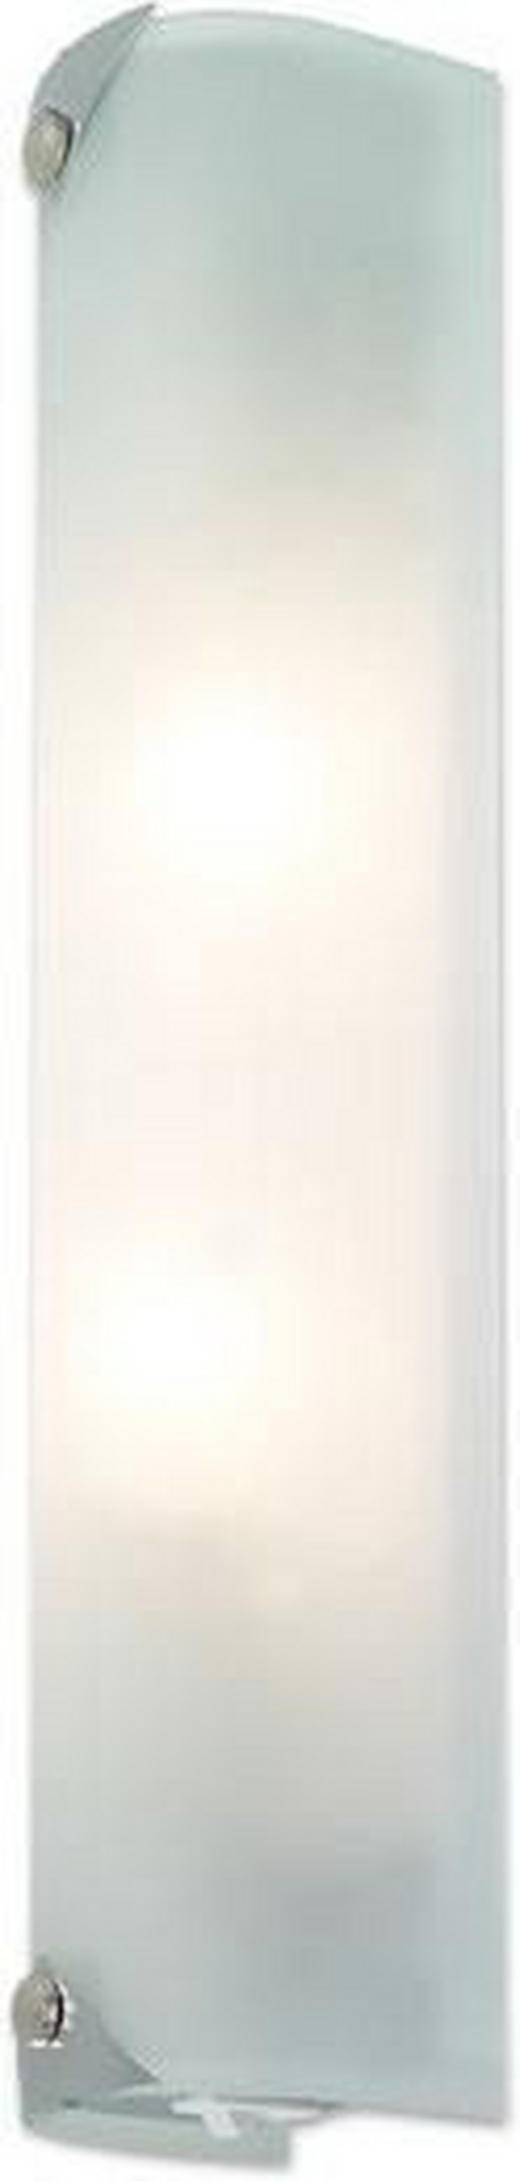 BADEZIMMER-WANDLEUCHTE - Chromfarben/Weiß, Basics, Metall (25cm)